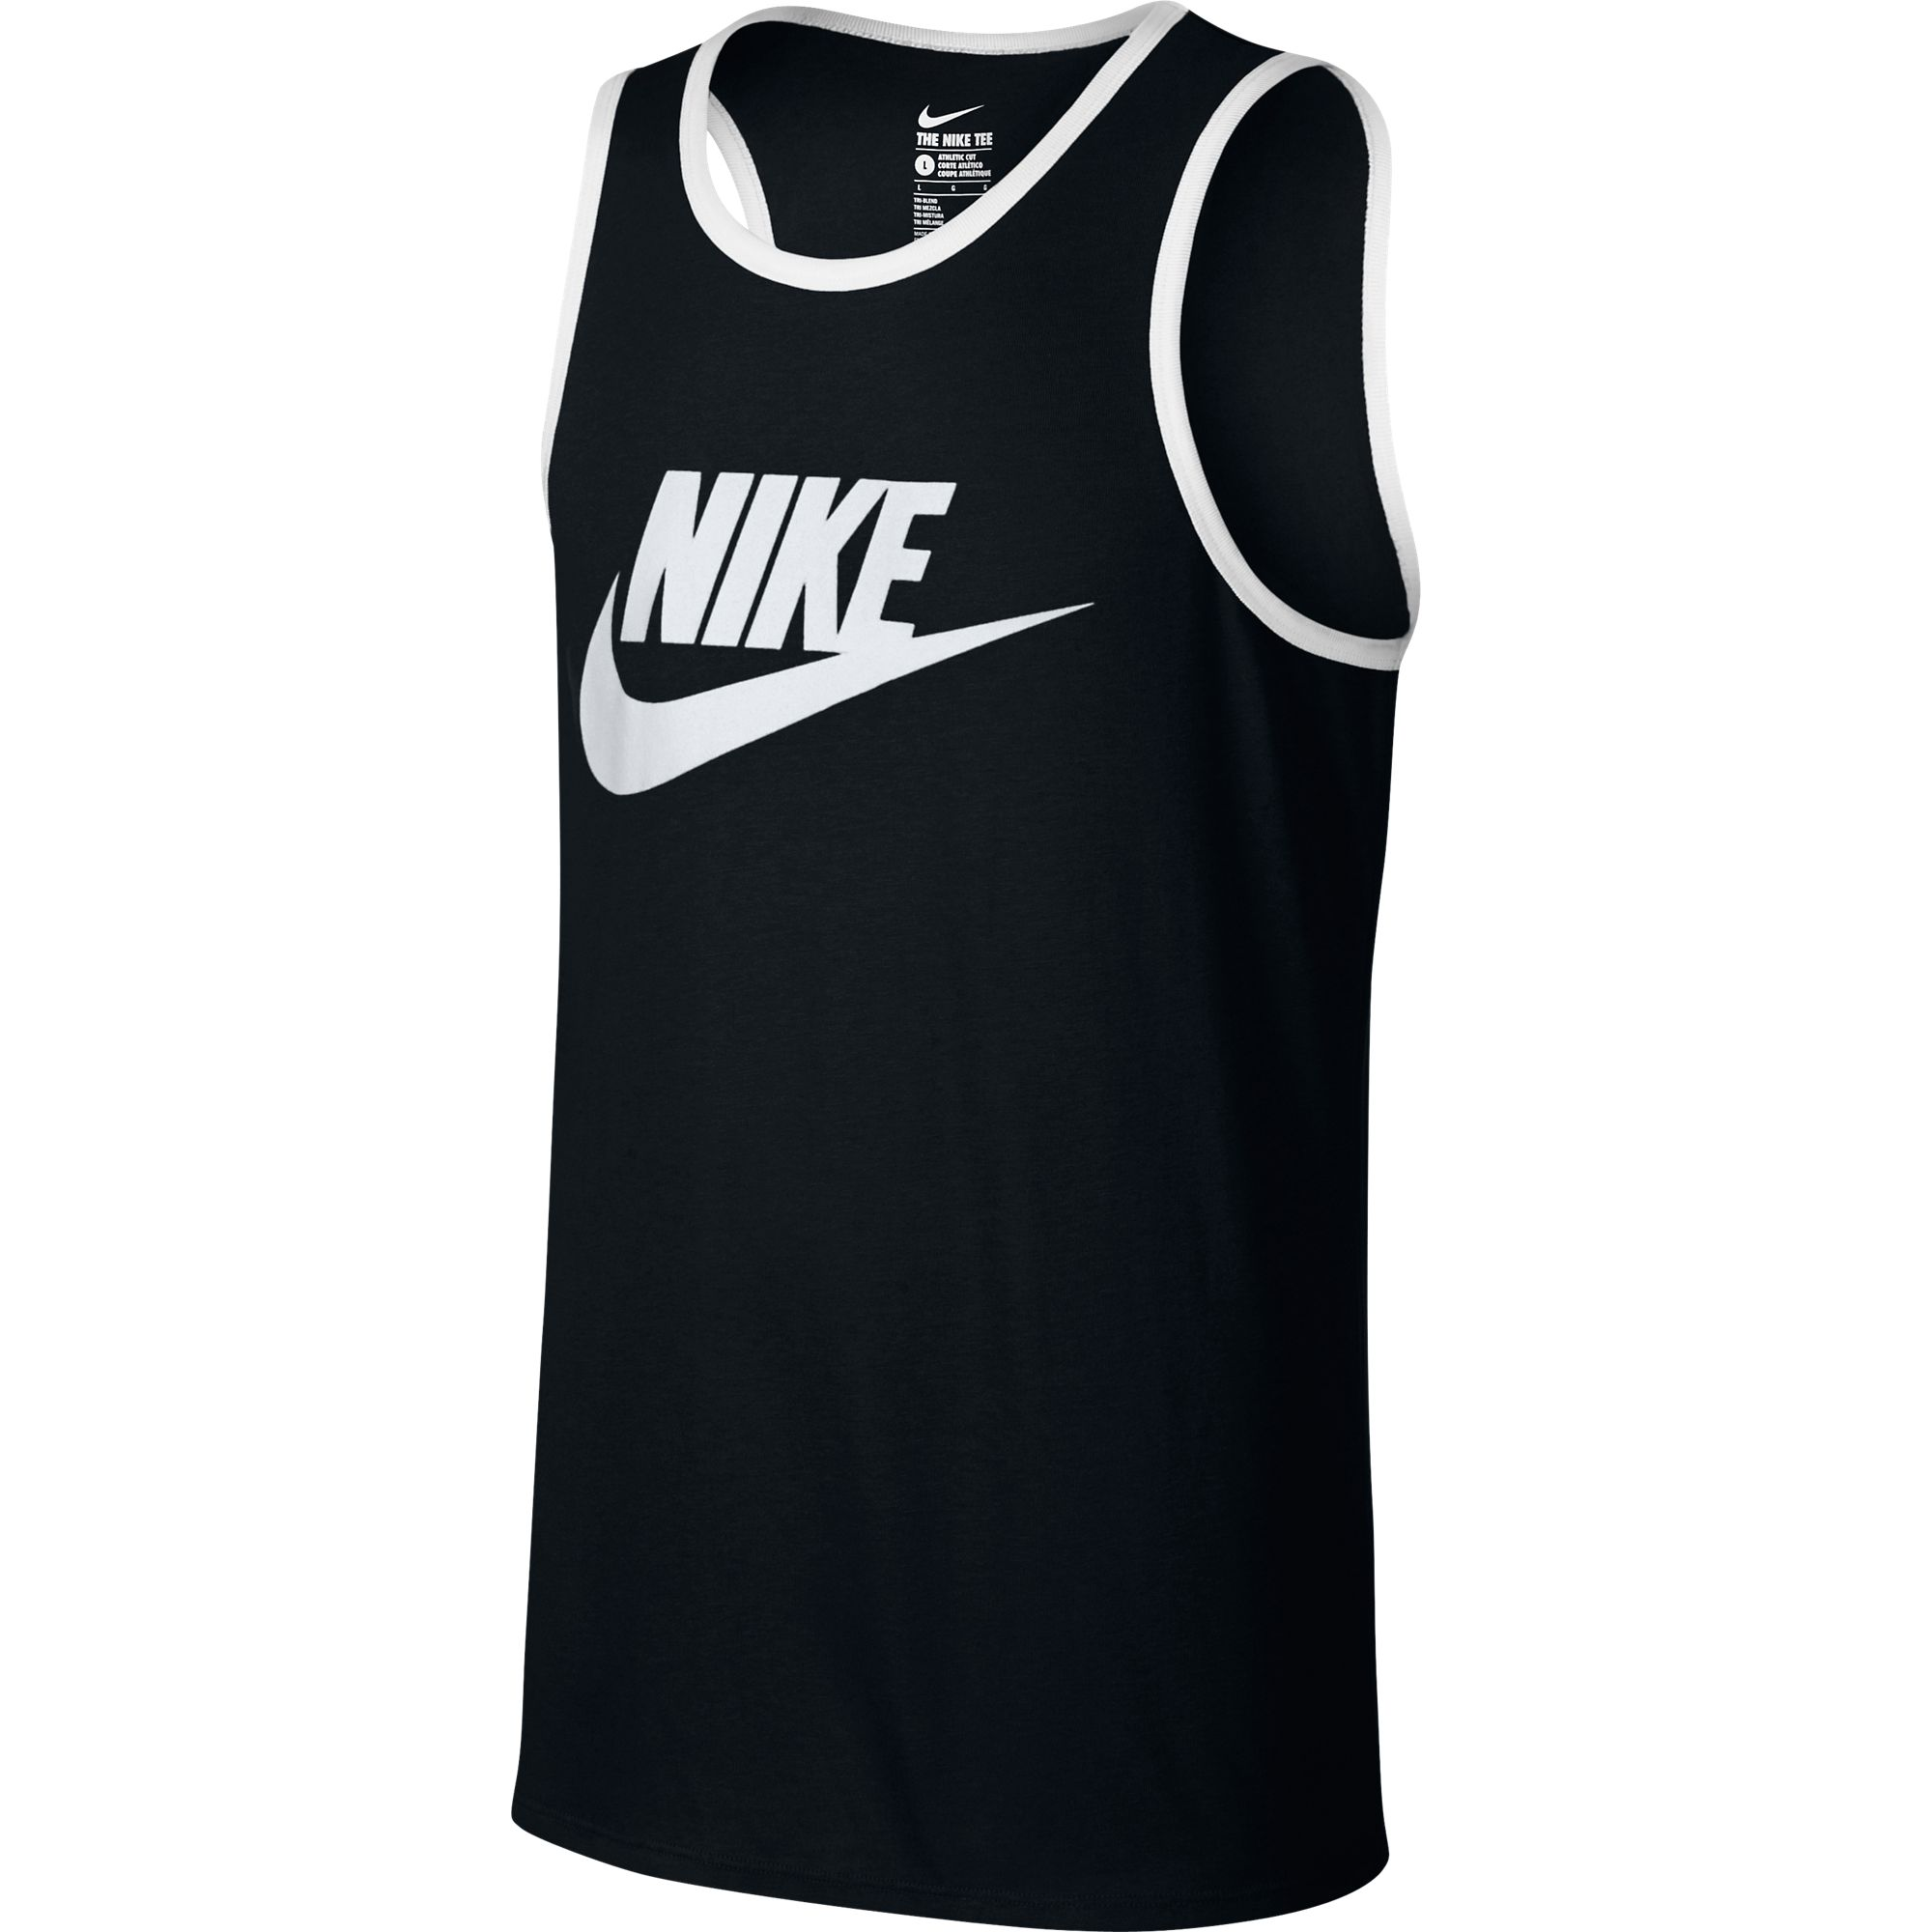 08b40d1060 Nike ACE Logo Men s Tank Top Athletic Black White 779234-011